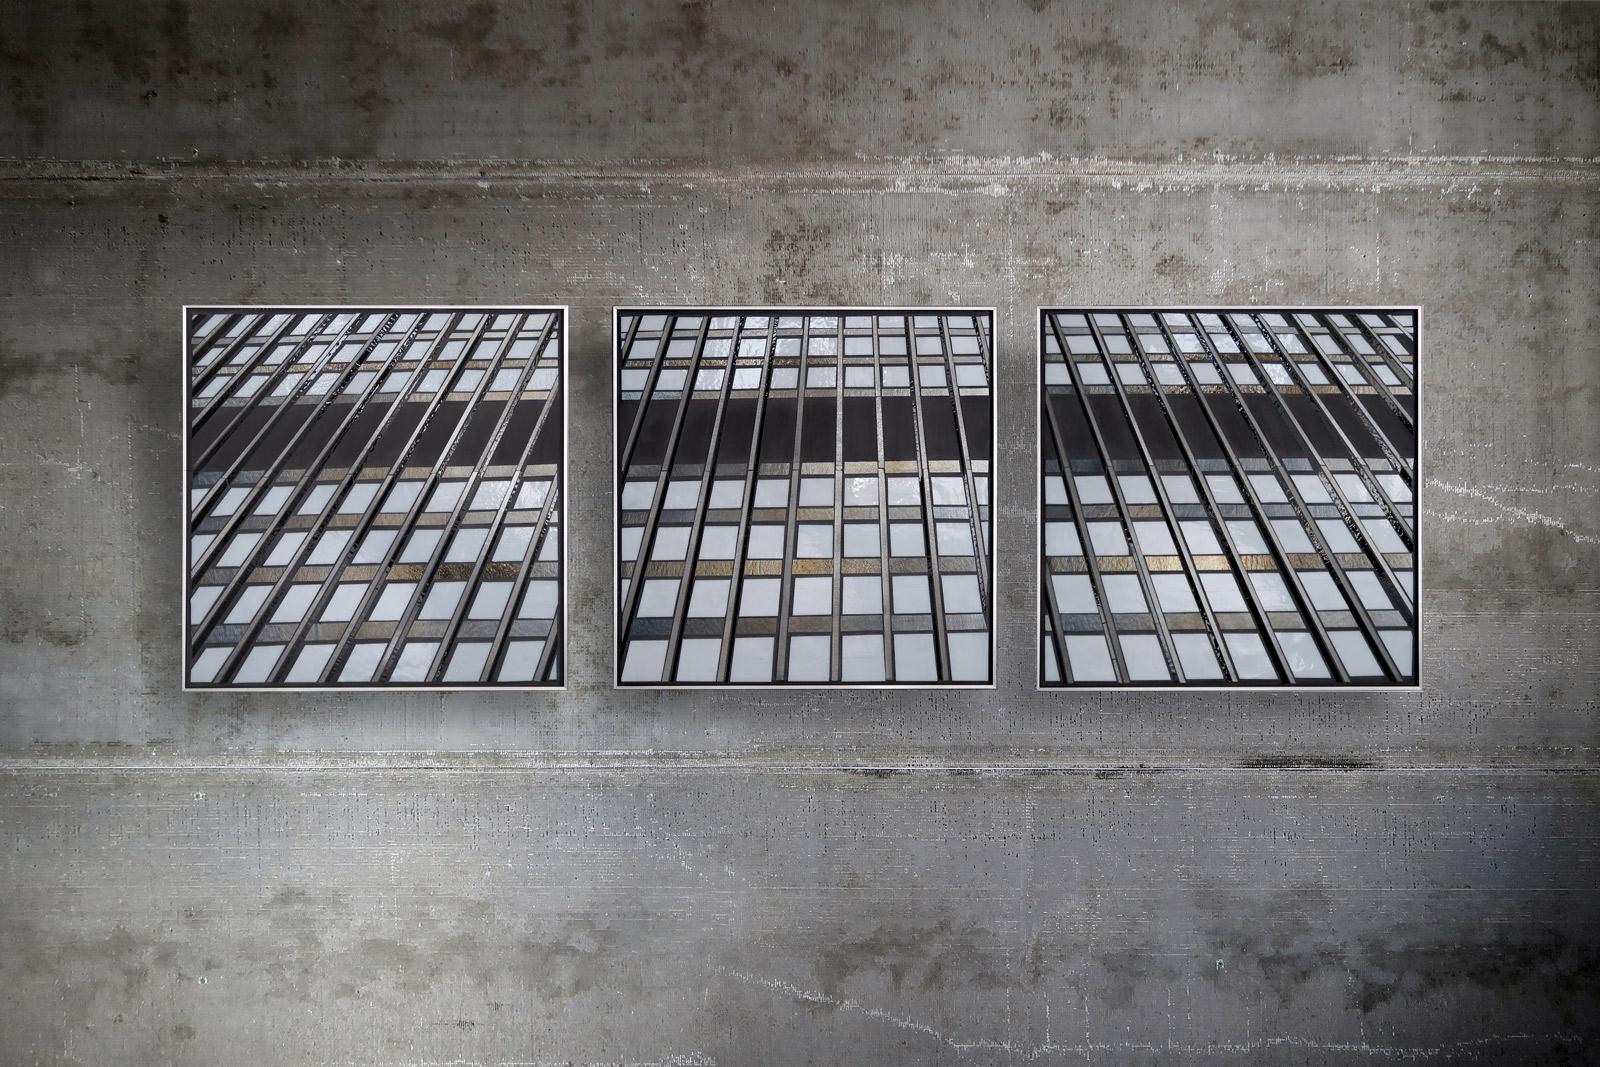 "Reflect 1.39a,b+c each 24""x24"" glass c Heather Hancock 2018"